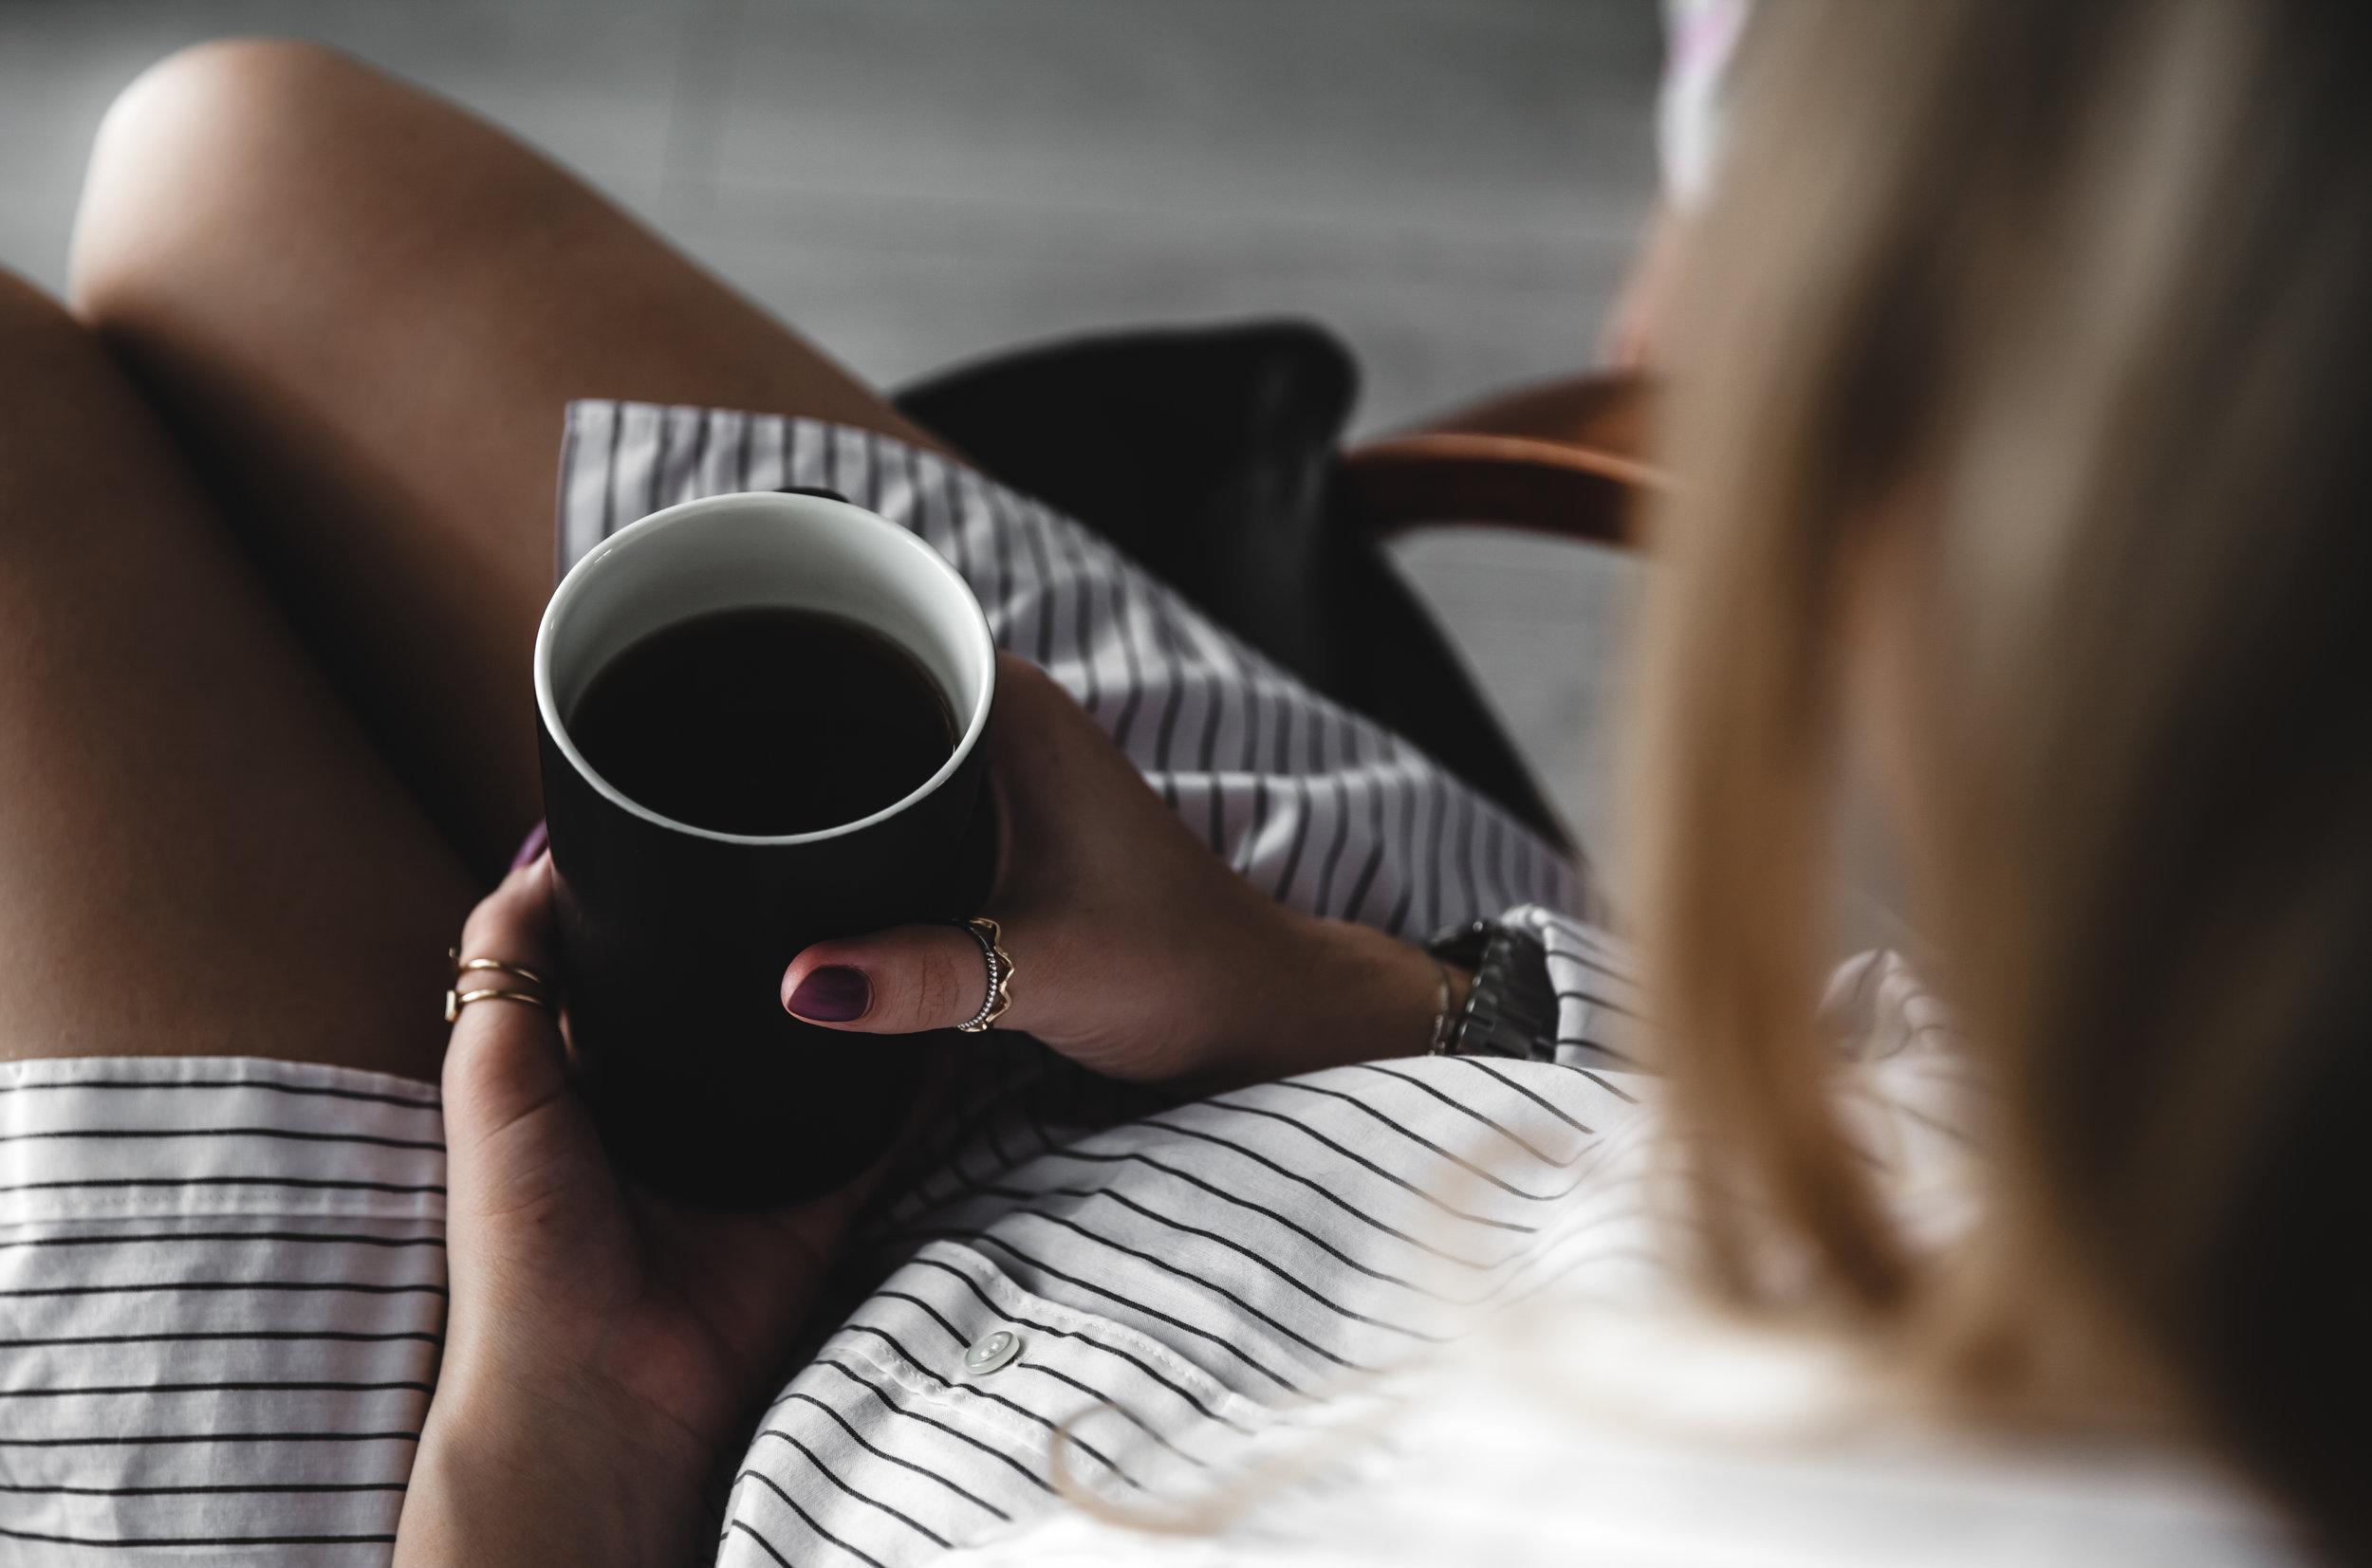 female-hands-holding-a-white-cup-of-tea-burgundy-73KTM5F.JPG